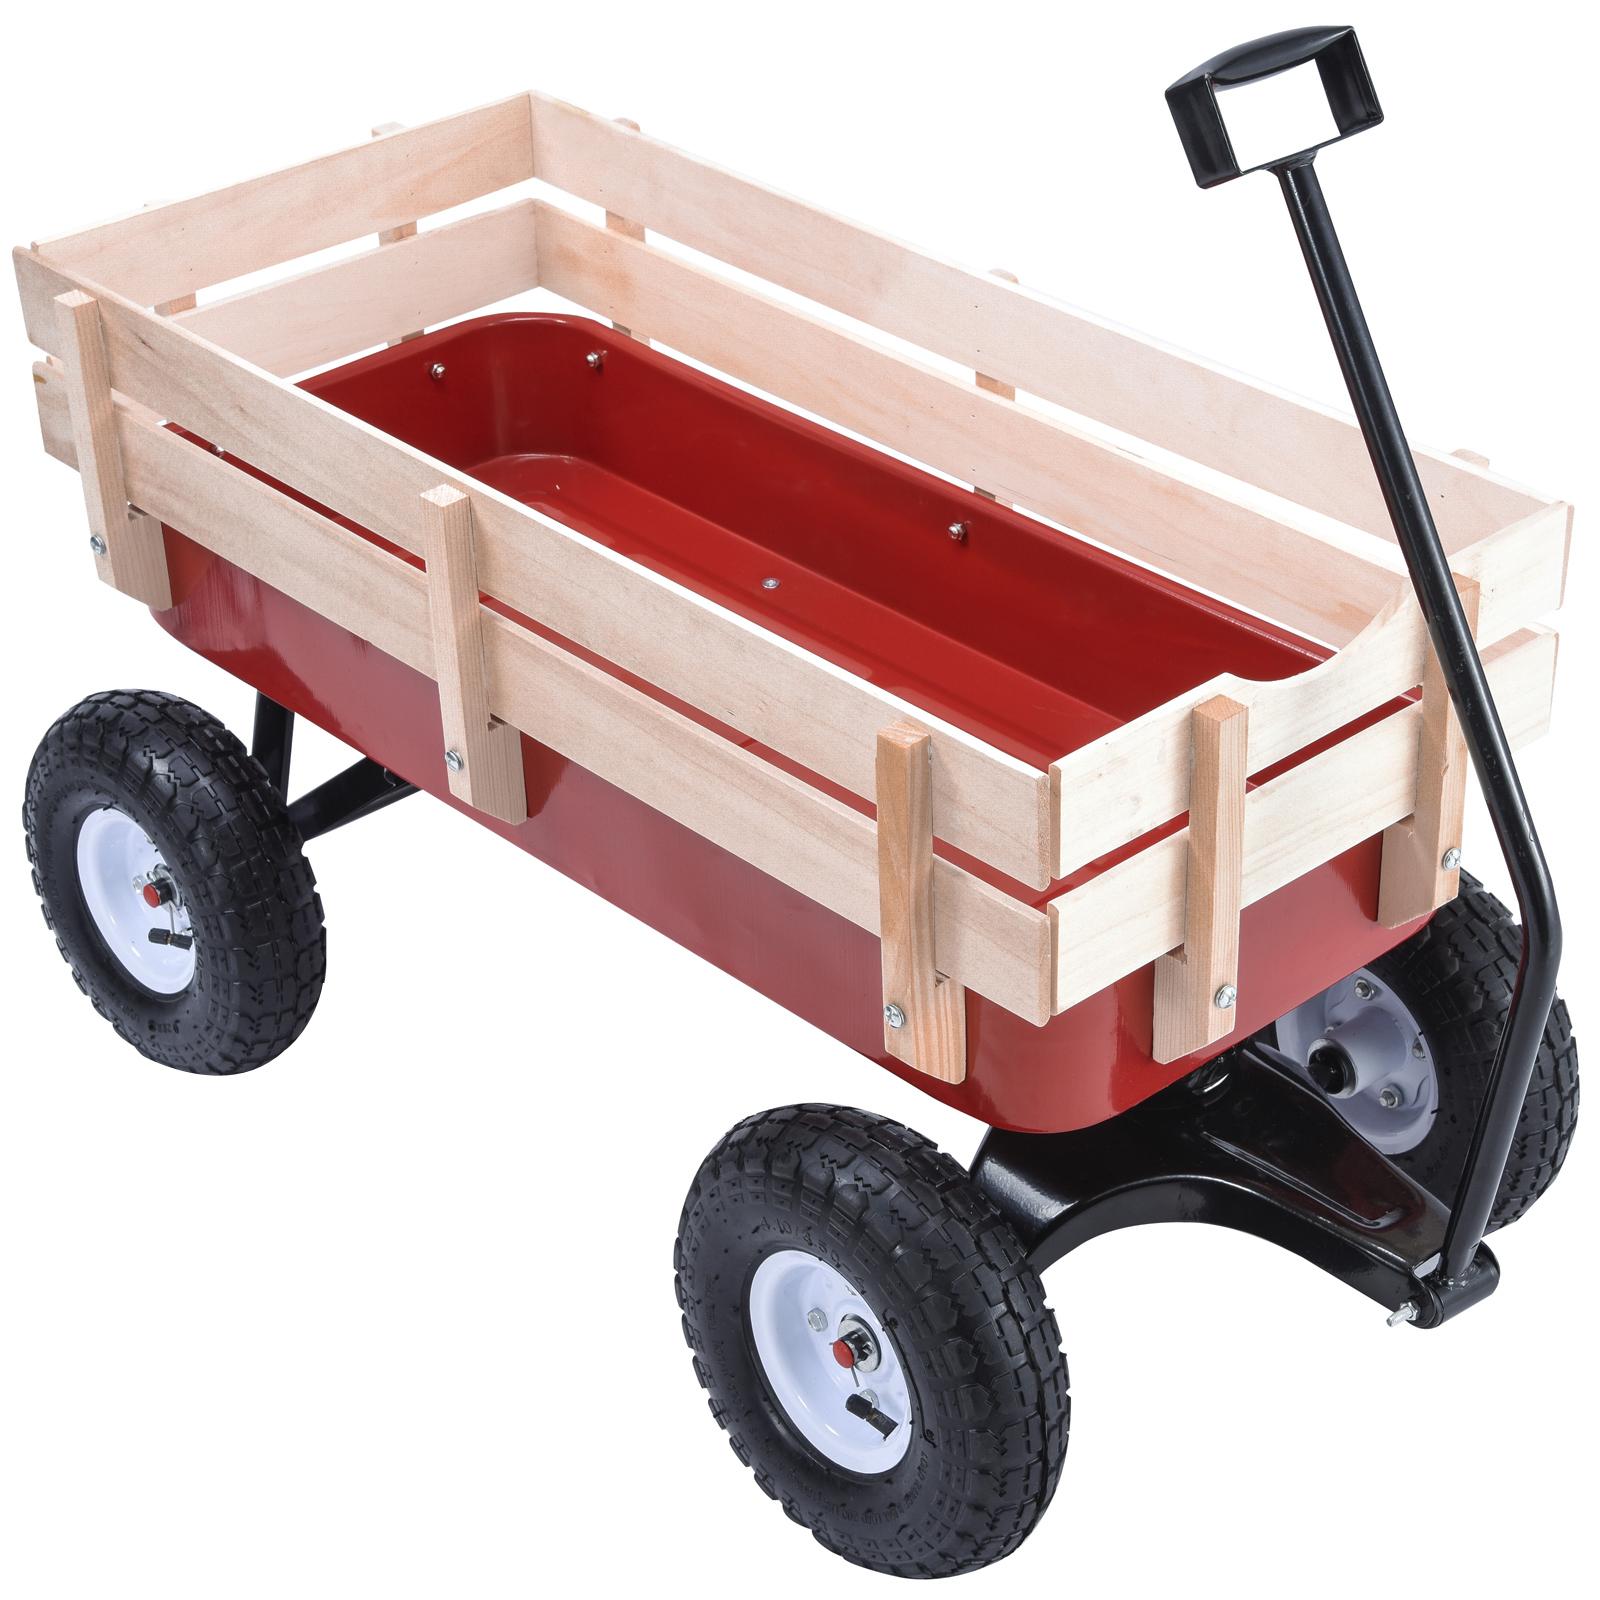 Pulling A Wagon : Bn lb all terrain pulling outdoor wood wagon garden